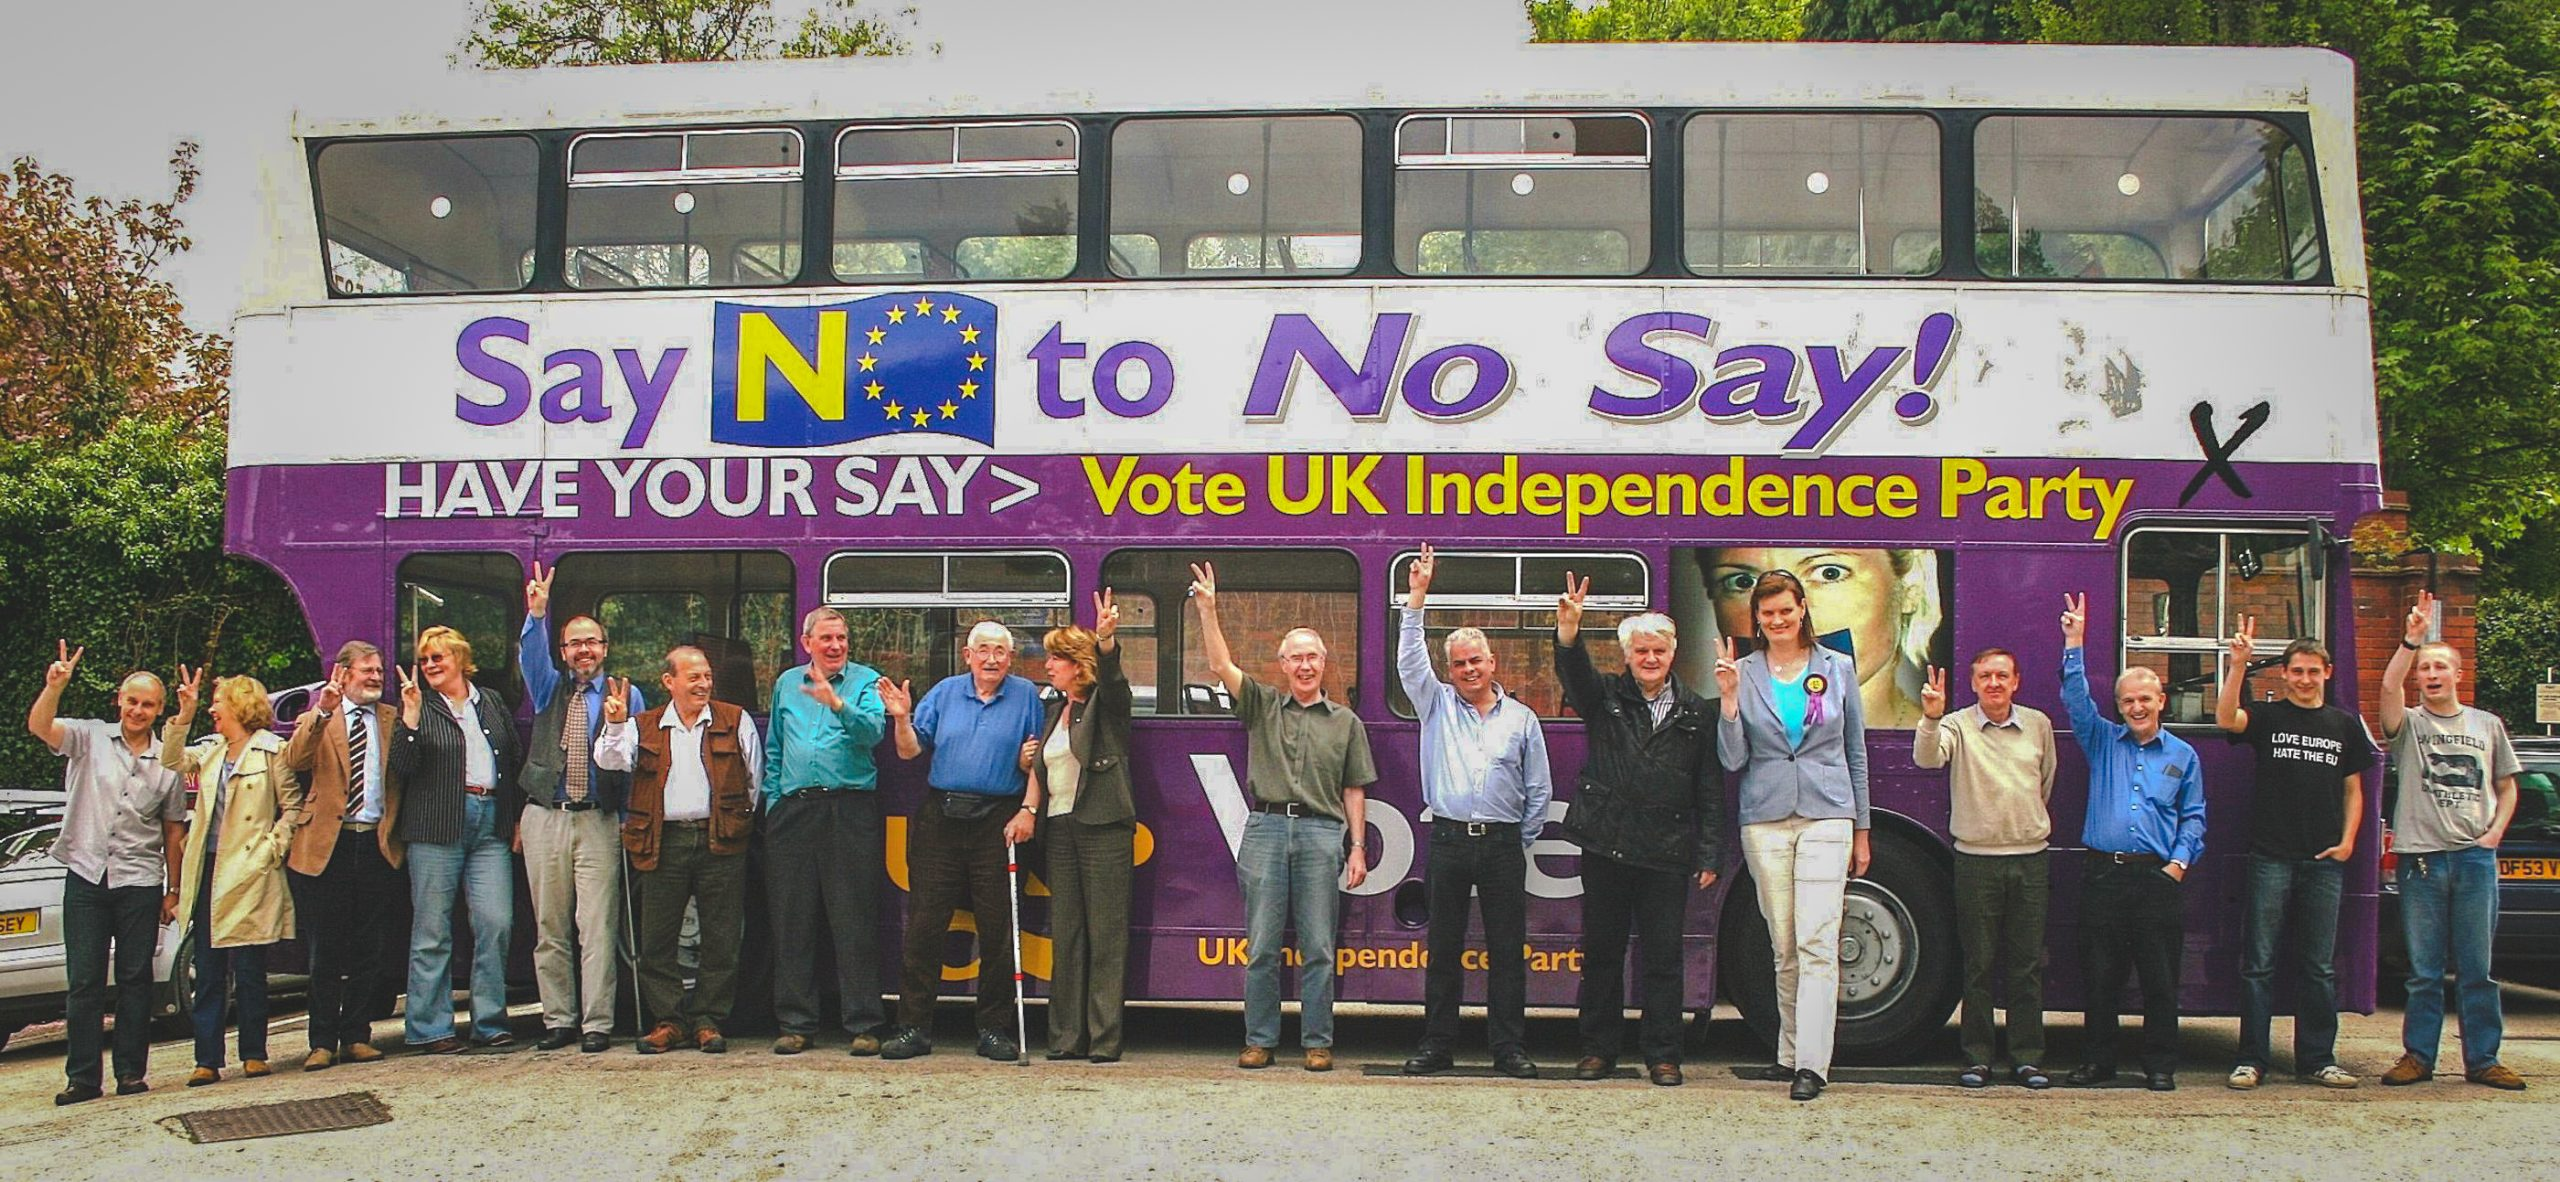 West Midlands UKIP activists, 2009 EU elections.